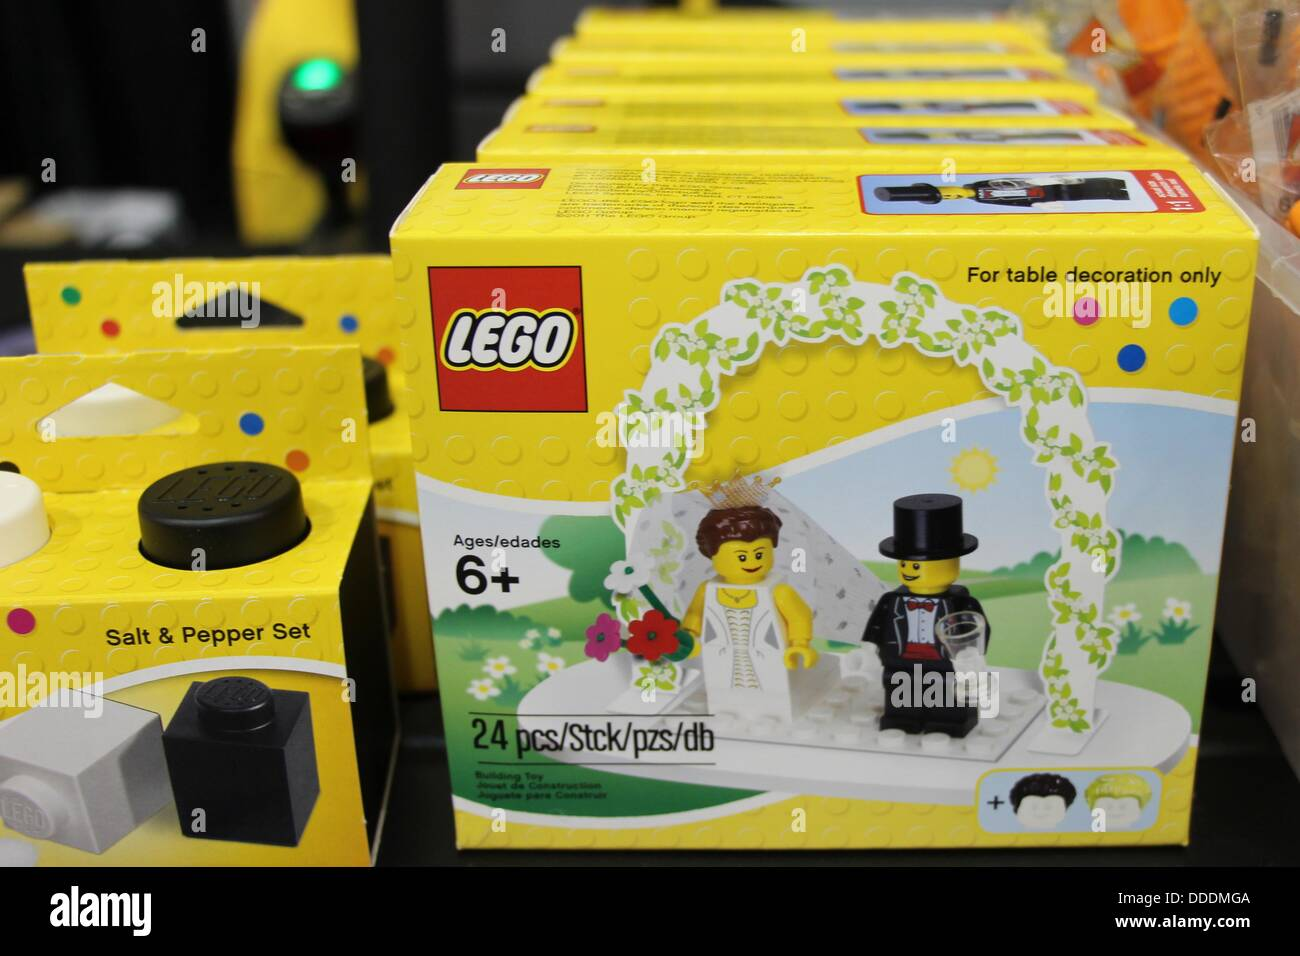 Lego Cake Topper Wedding - Wedding Cake Flavors